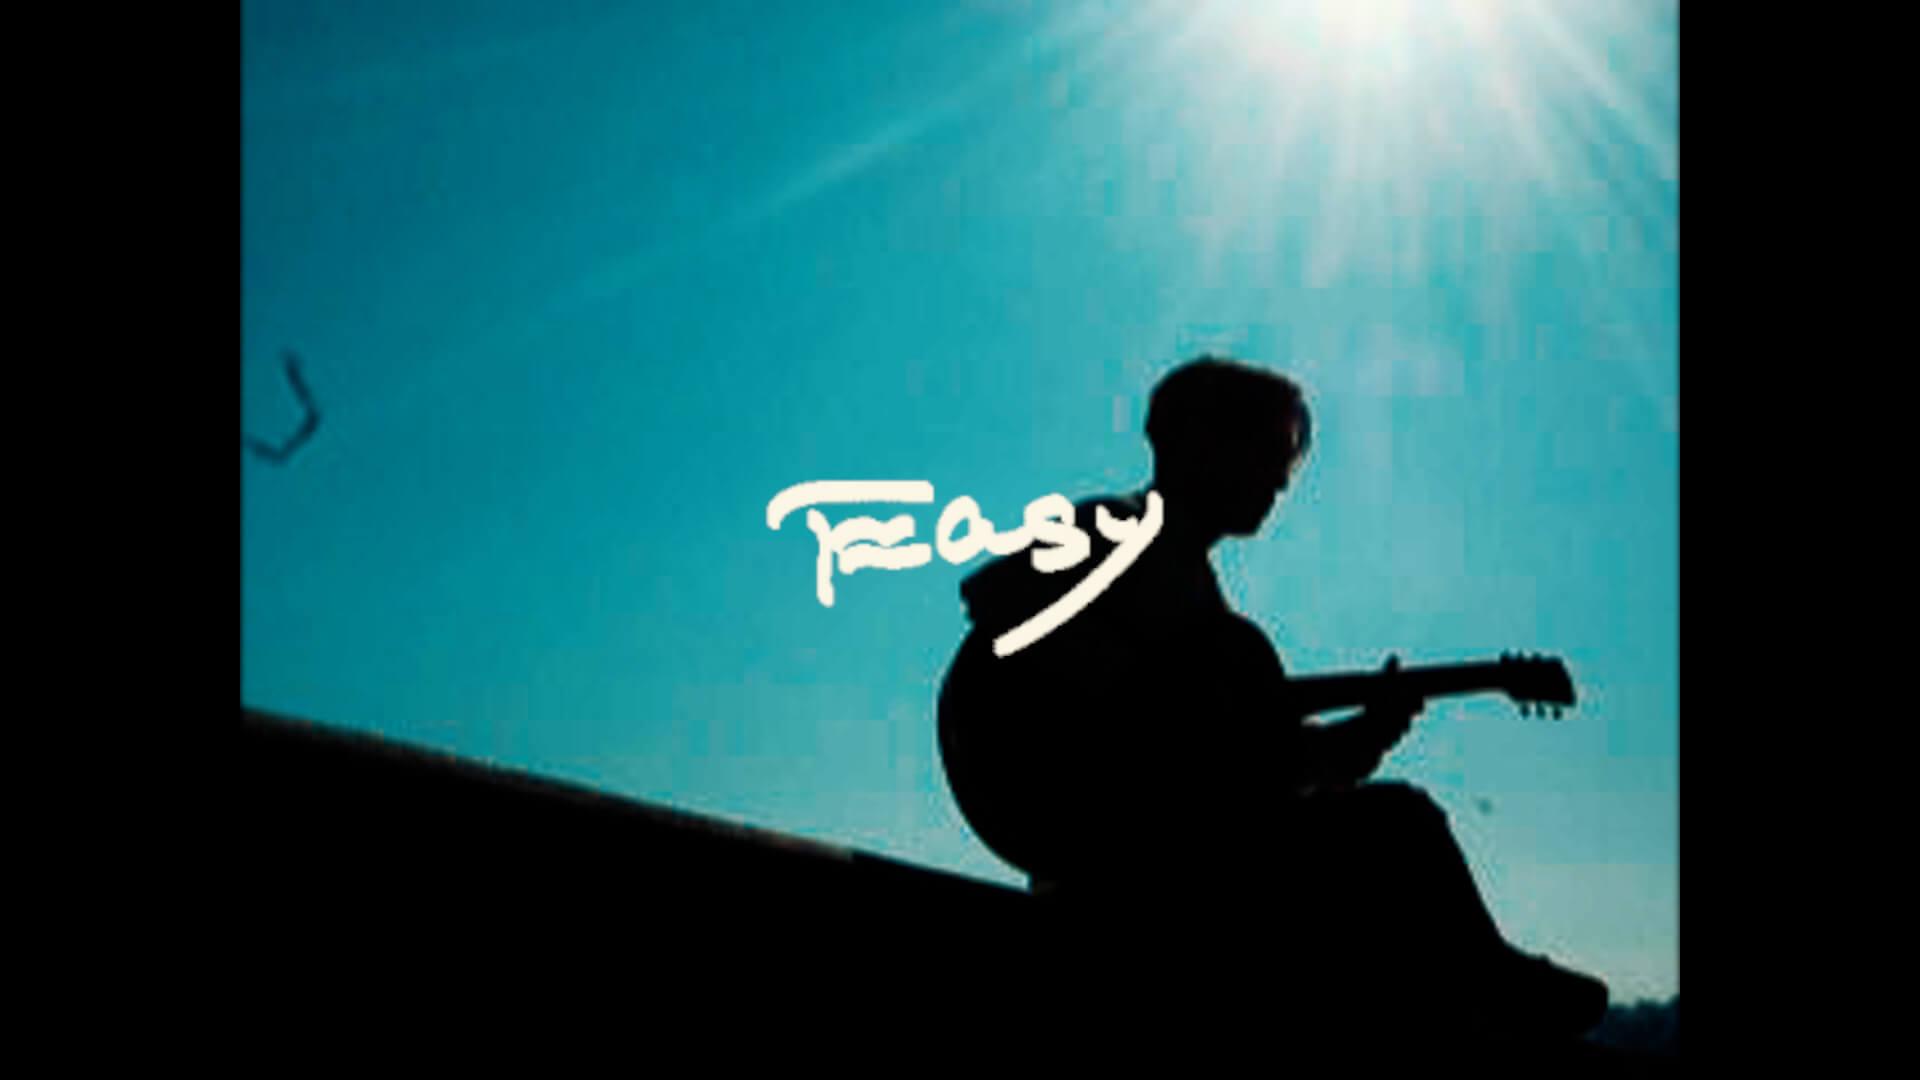 "SuchmosのTAIKINGによる最新曲""Easy""のミュージックビデオが公開!地元・横浜でのイベント開催も発表 music210802_taiking_3"